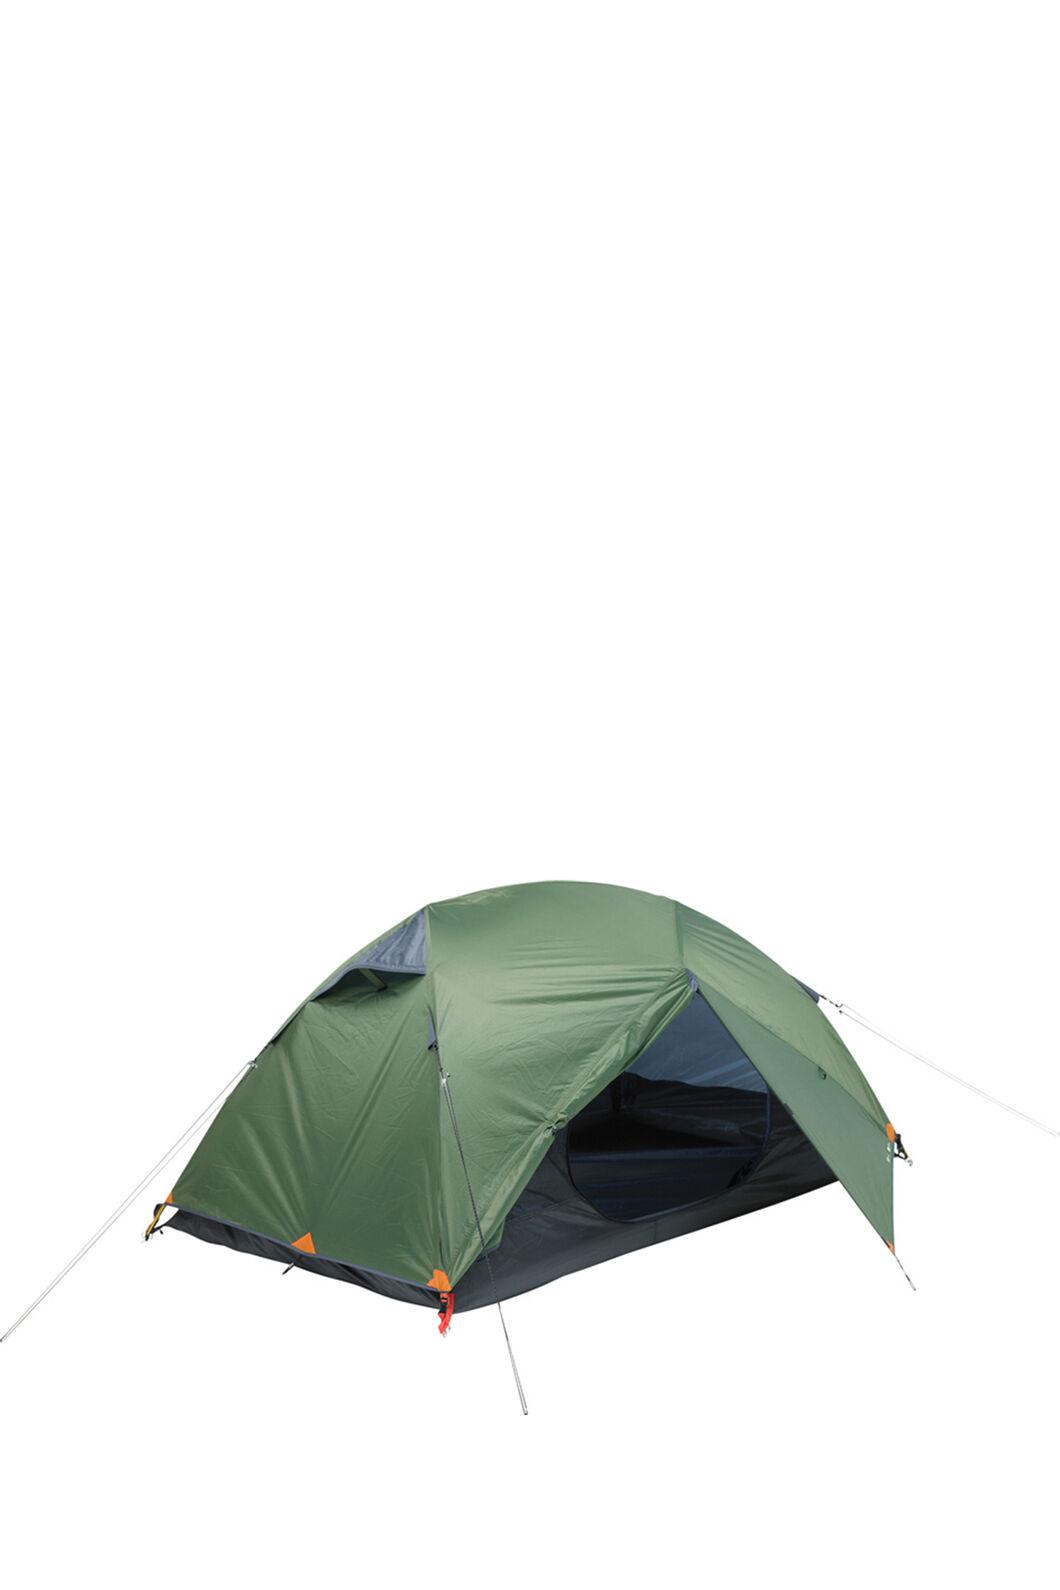 Explore Planet Earth Spartan 3 Person Hiking Tent, None, hi-res